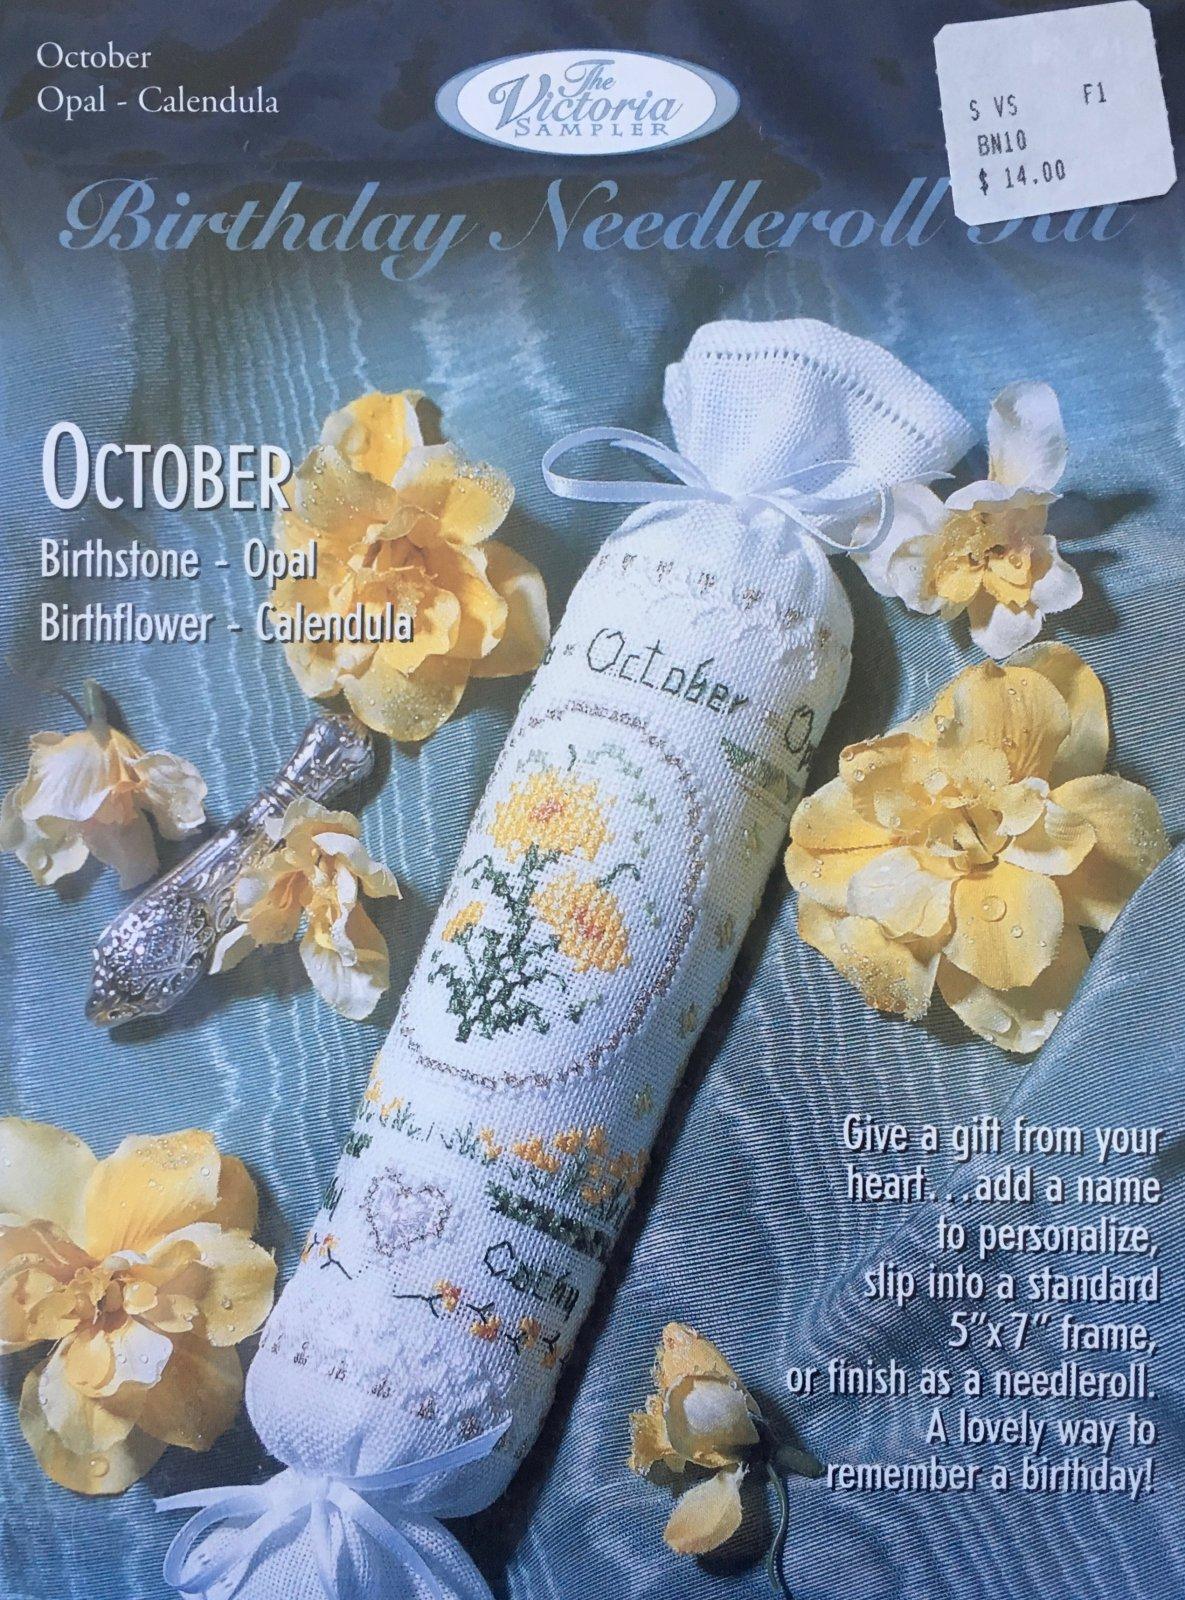 The Victoria Sampler: Birthday Needleroll Kit October BN #10